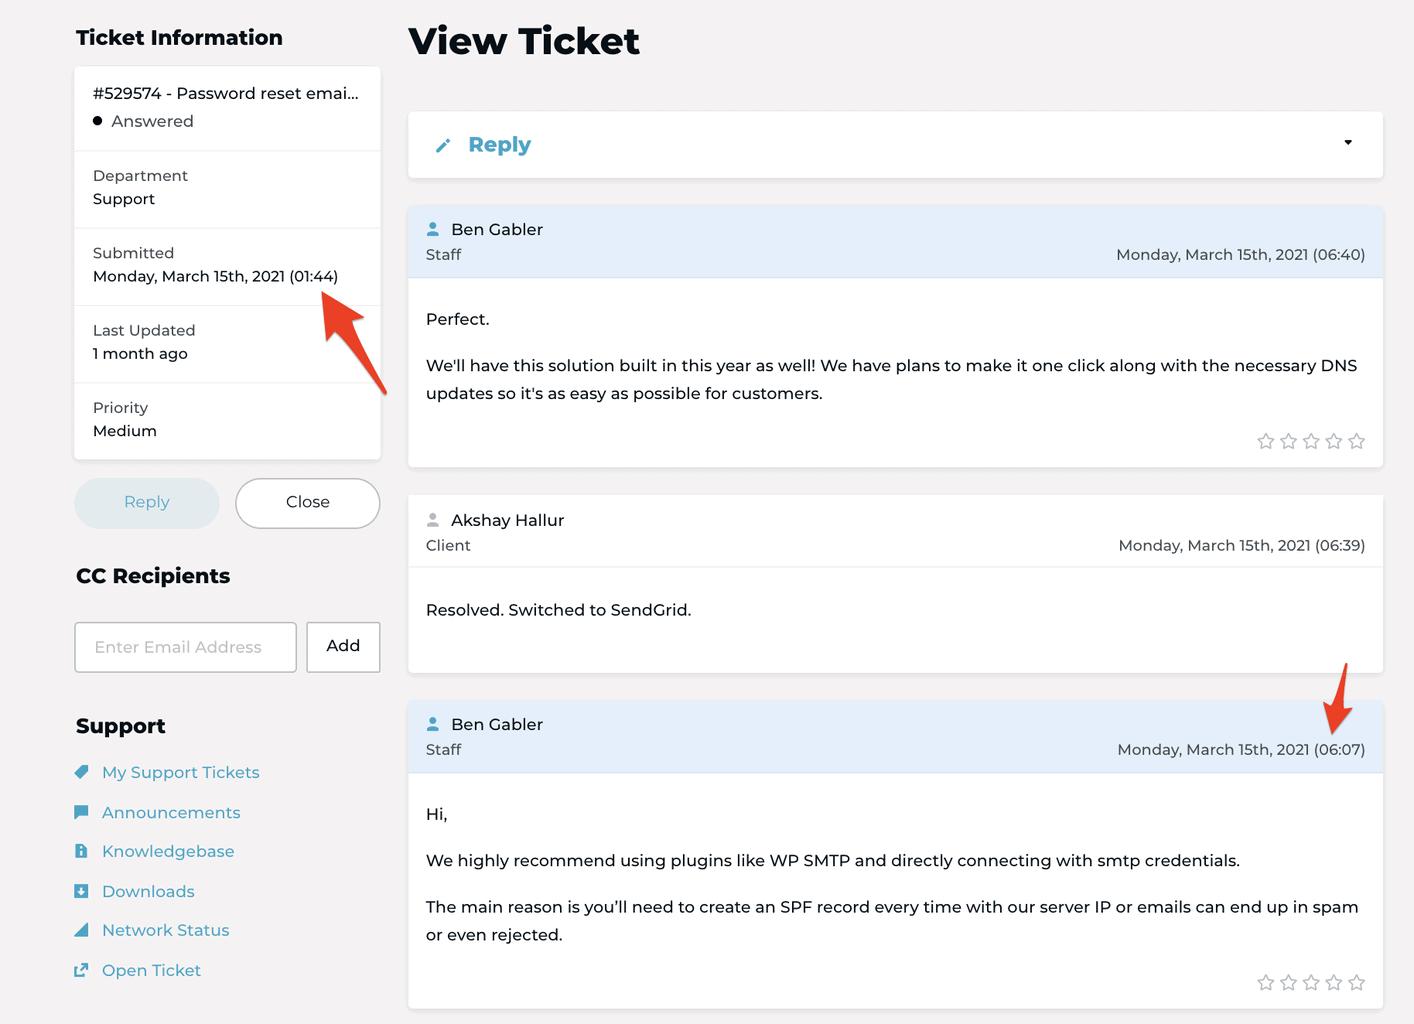 Rocket.net ticket support